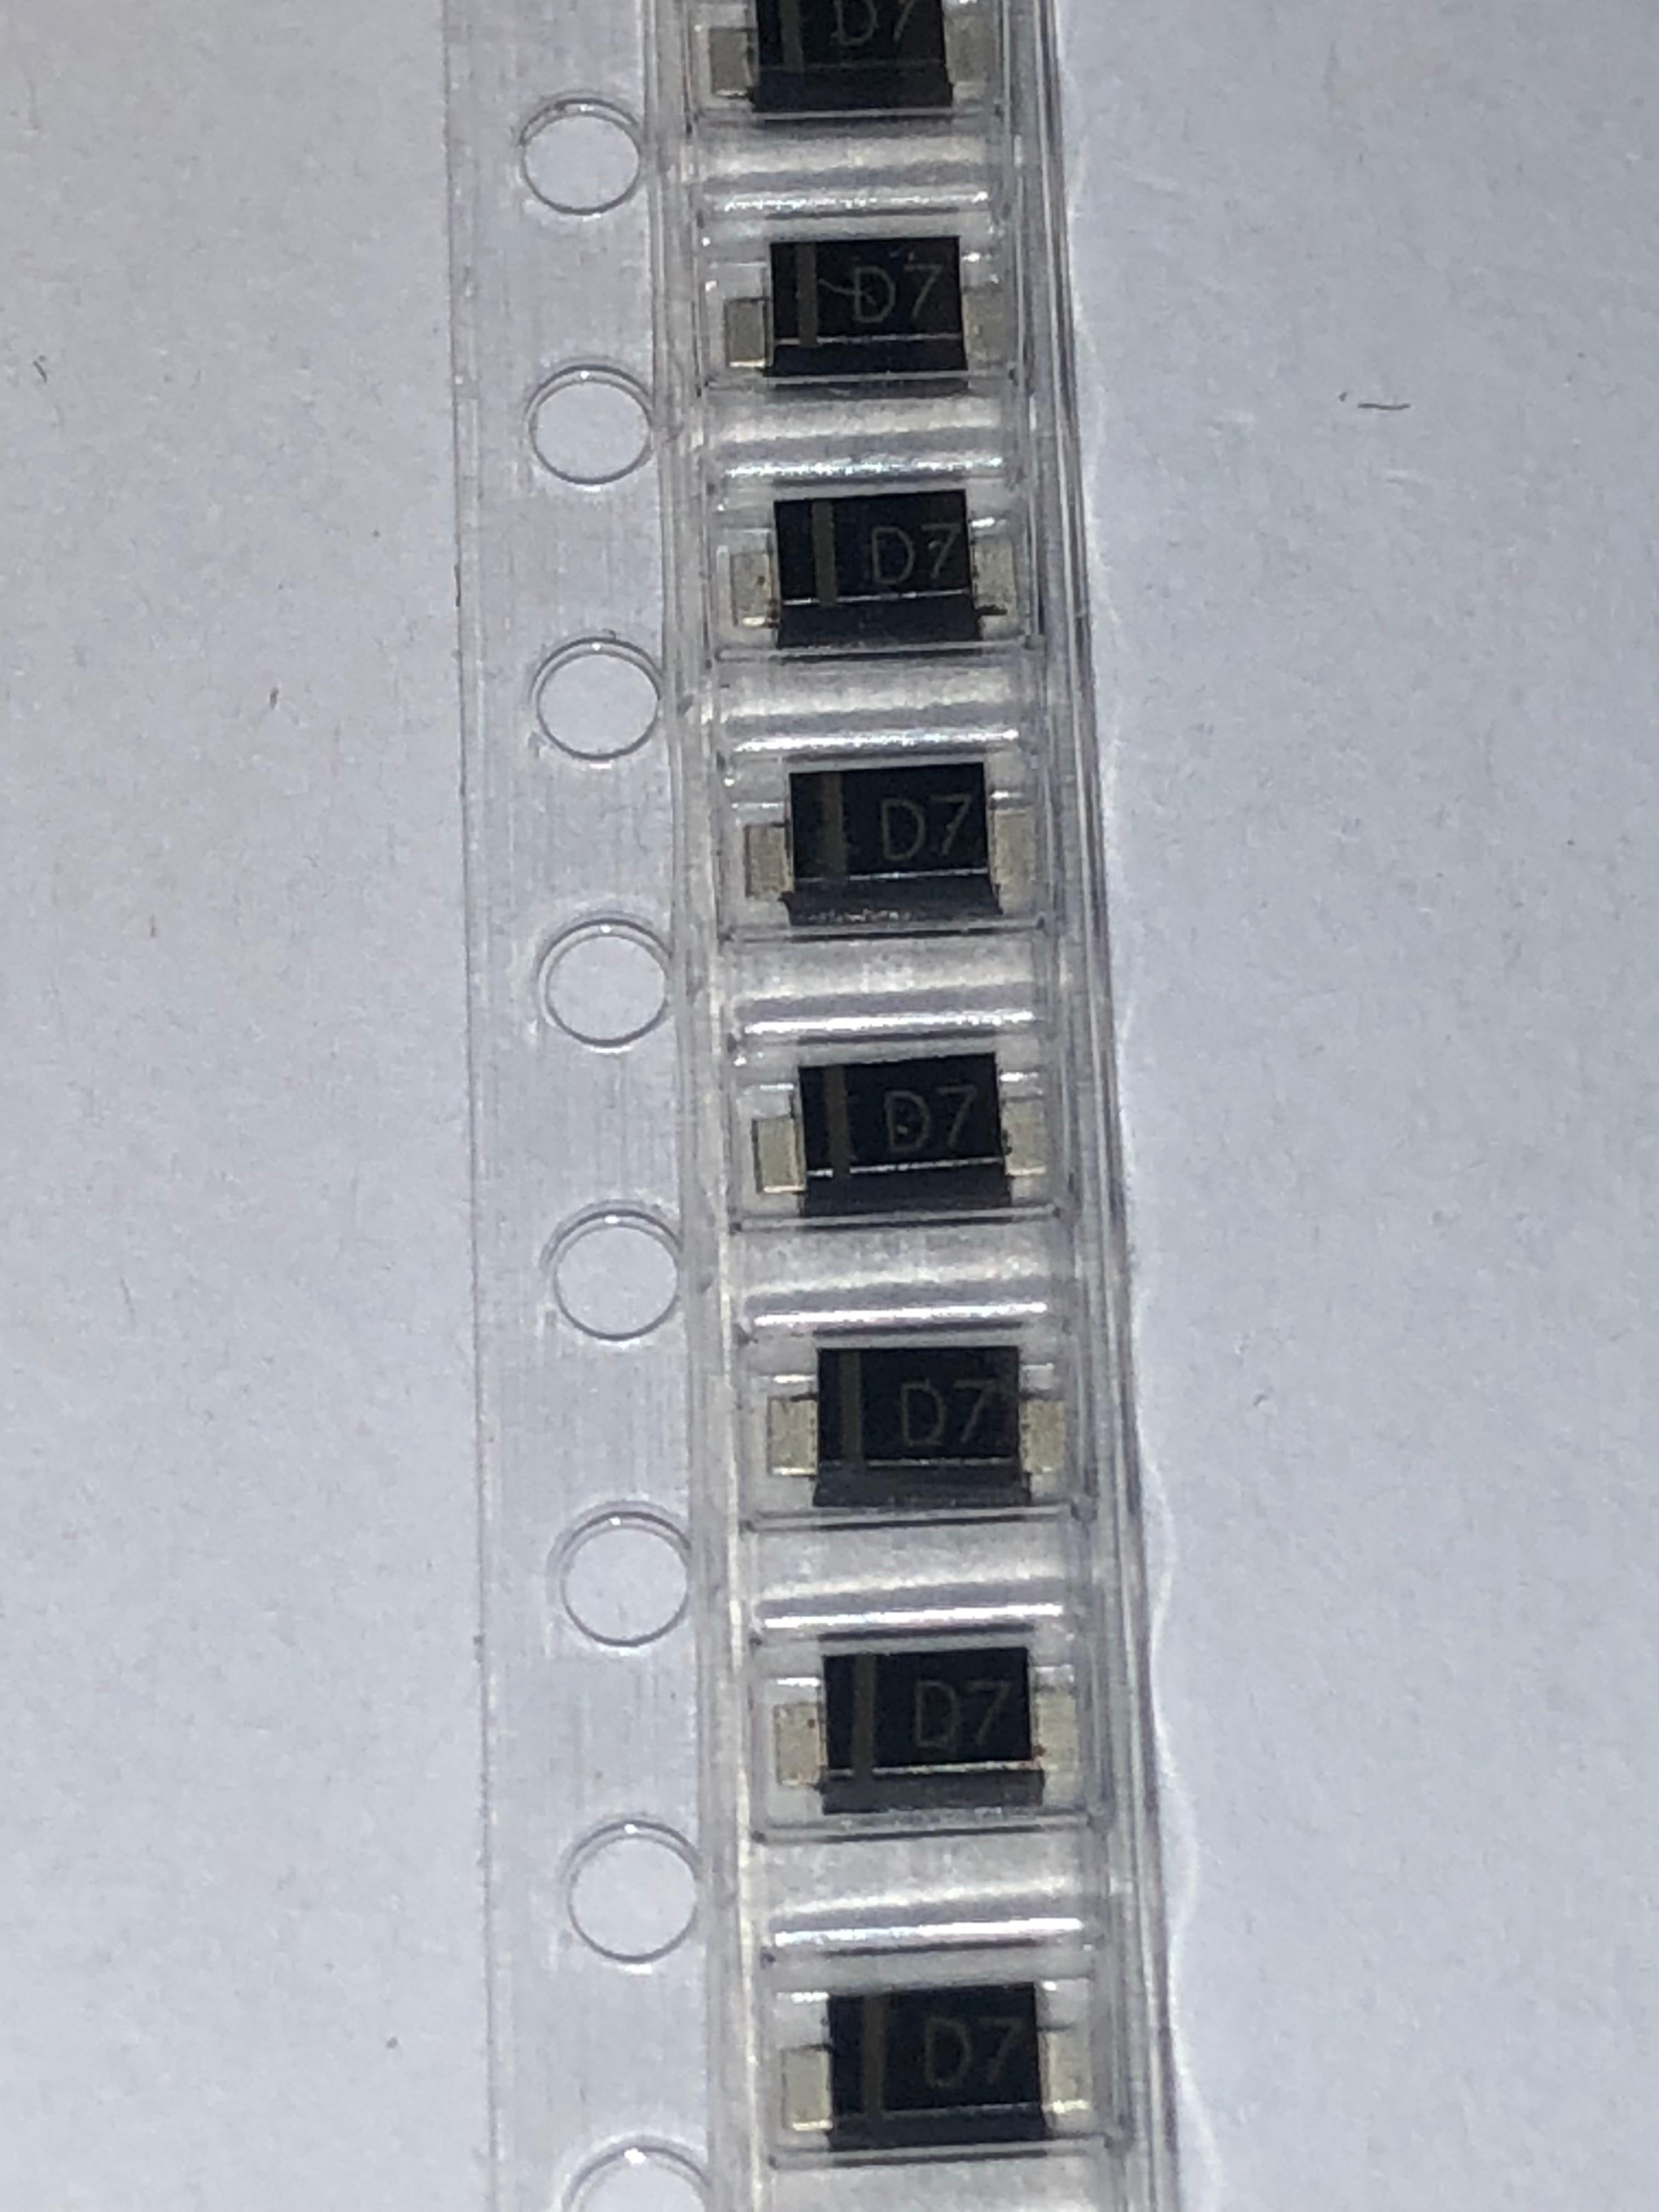 100 pcs/lot paste diode FM4007-M 1N4007 SOD-123 1206 D7 SOD4007